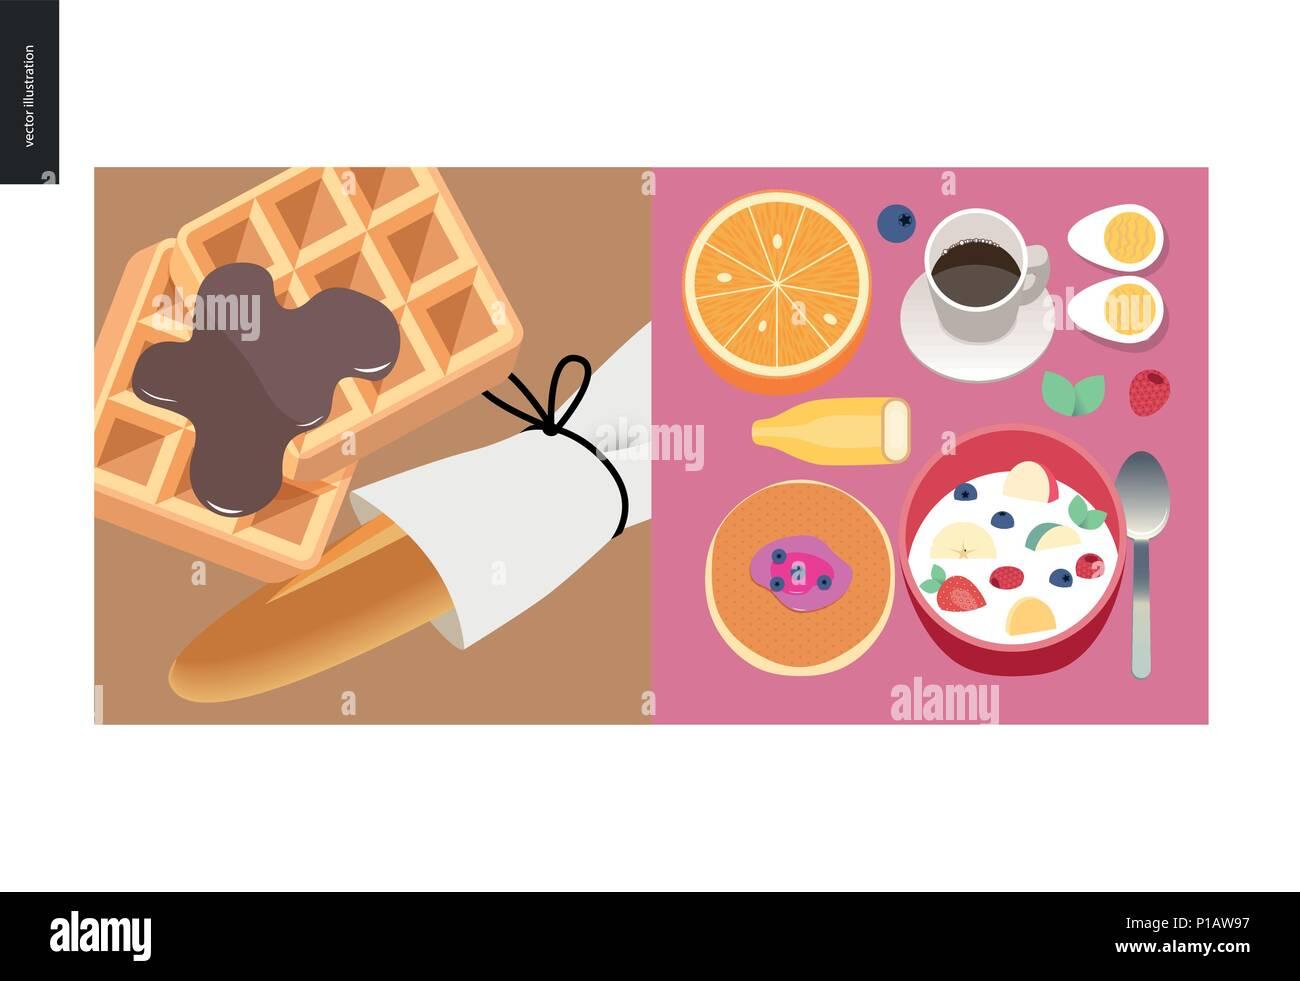 Simple things - color - flat cartoon vector illustration of breakfast meals, orange, coffee, banana, eggs, pancake, cereal, belgian waffles, chocolate - Stock Vector